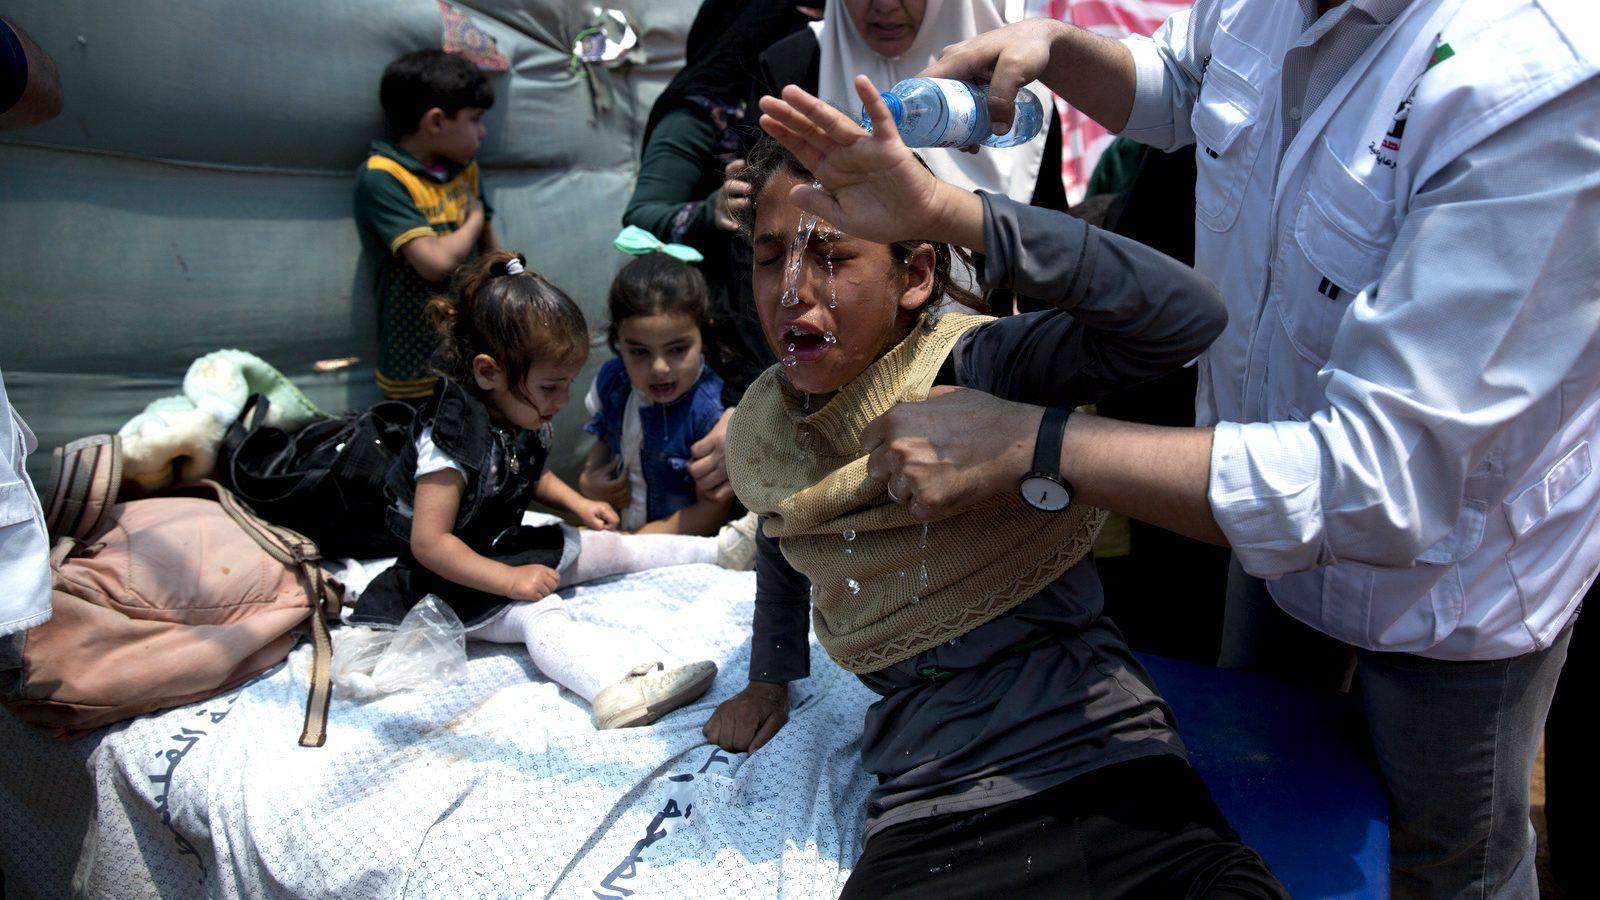 Peringatan Hari Al-Quds, 525 Warga Palestina Luka-Luka Oleh